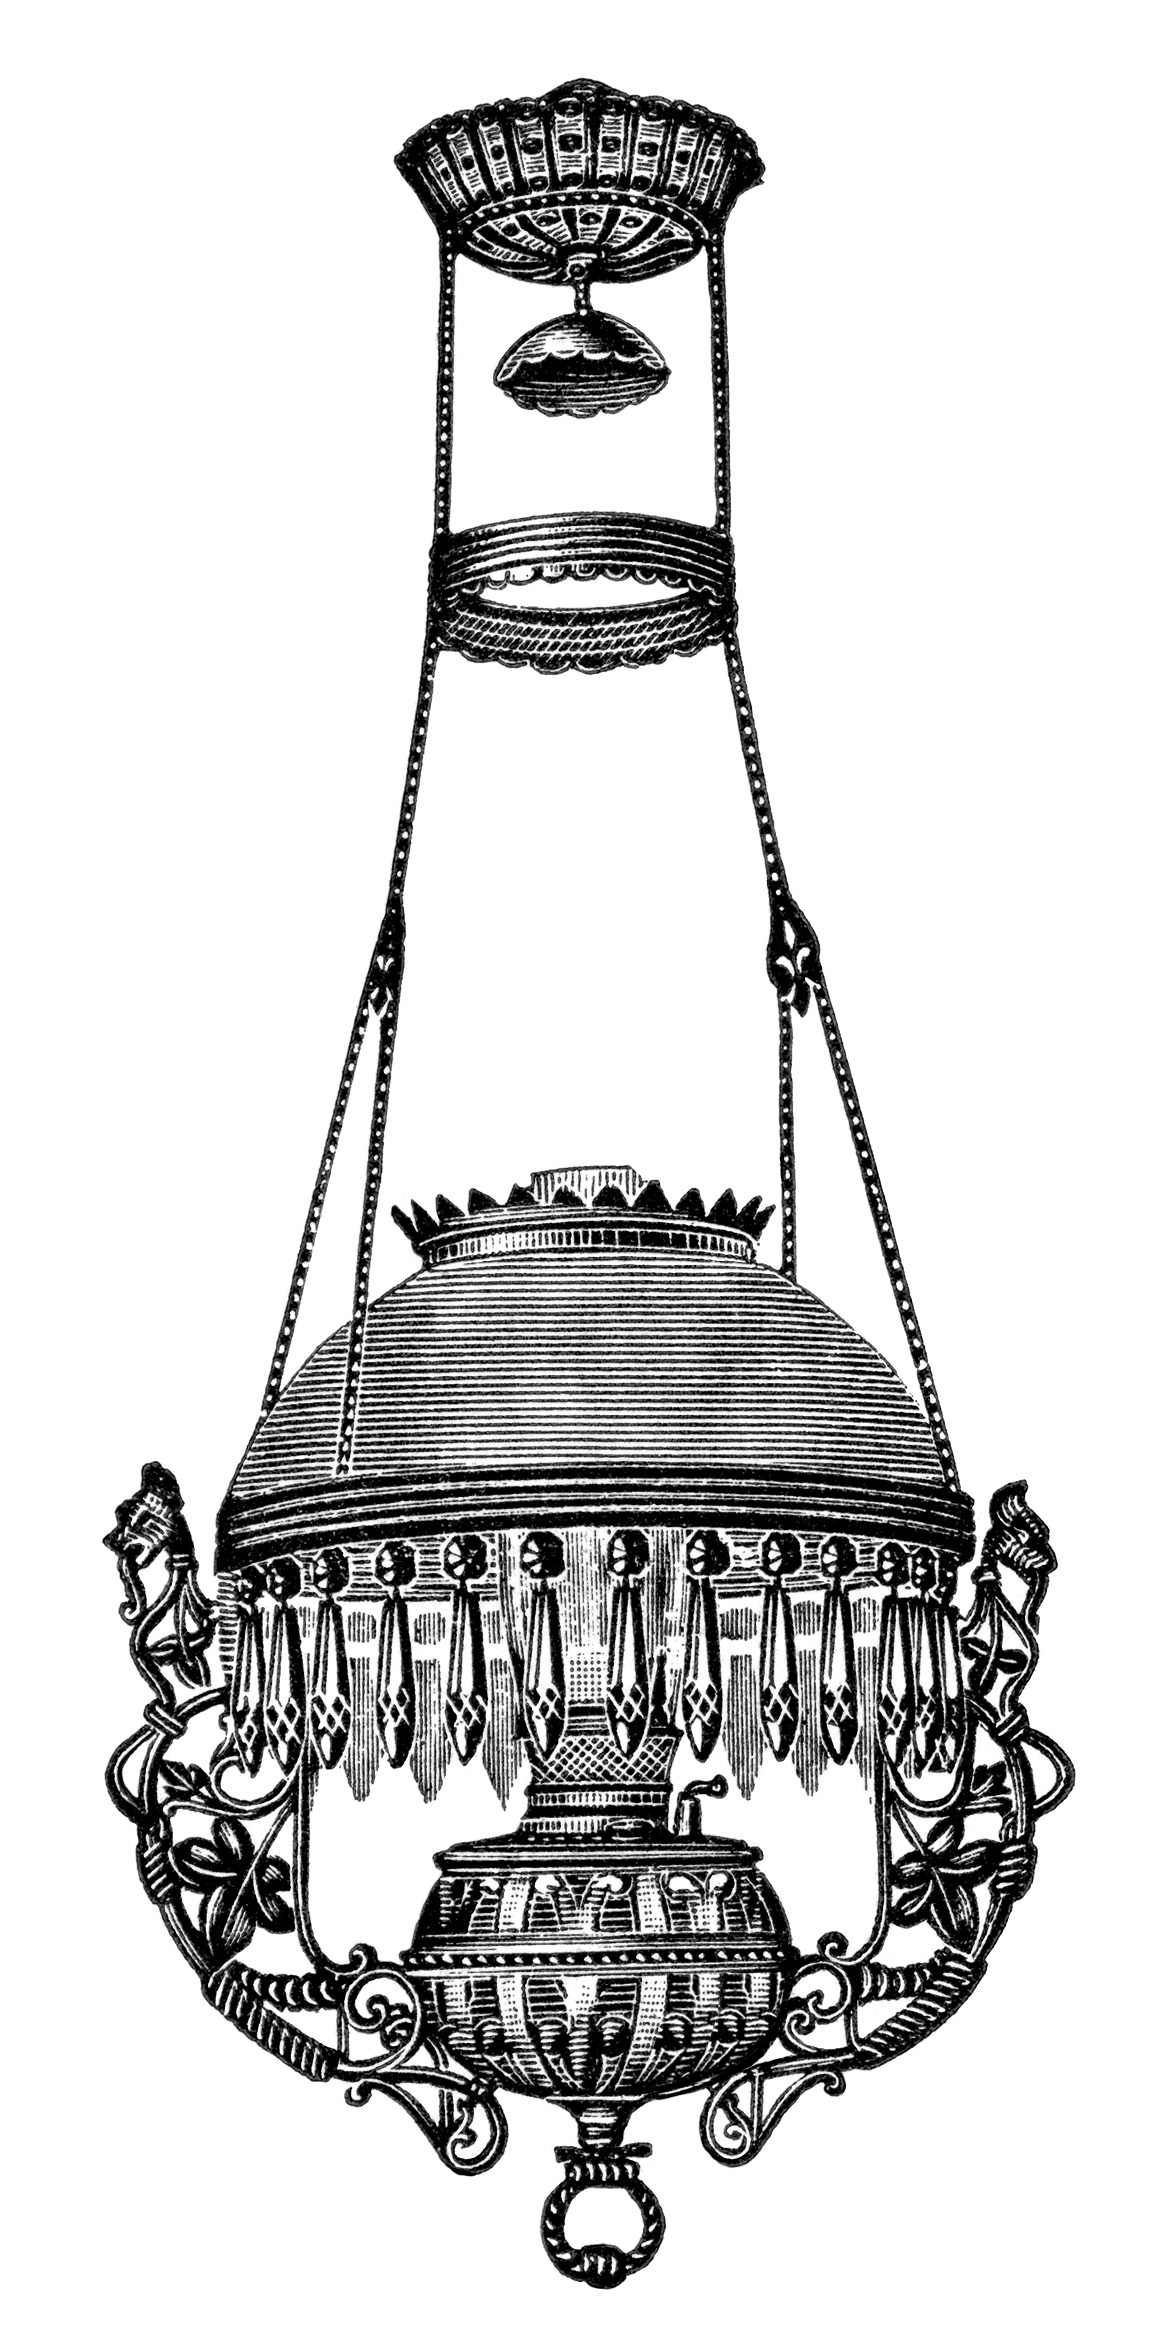 Hanging Lamps Vintage Clip Art